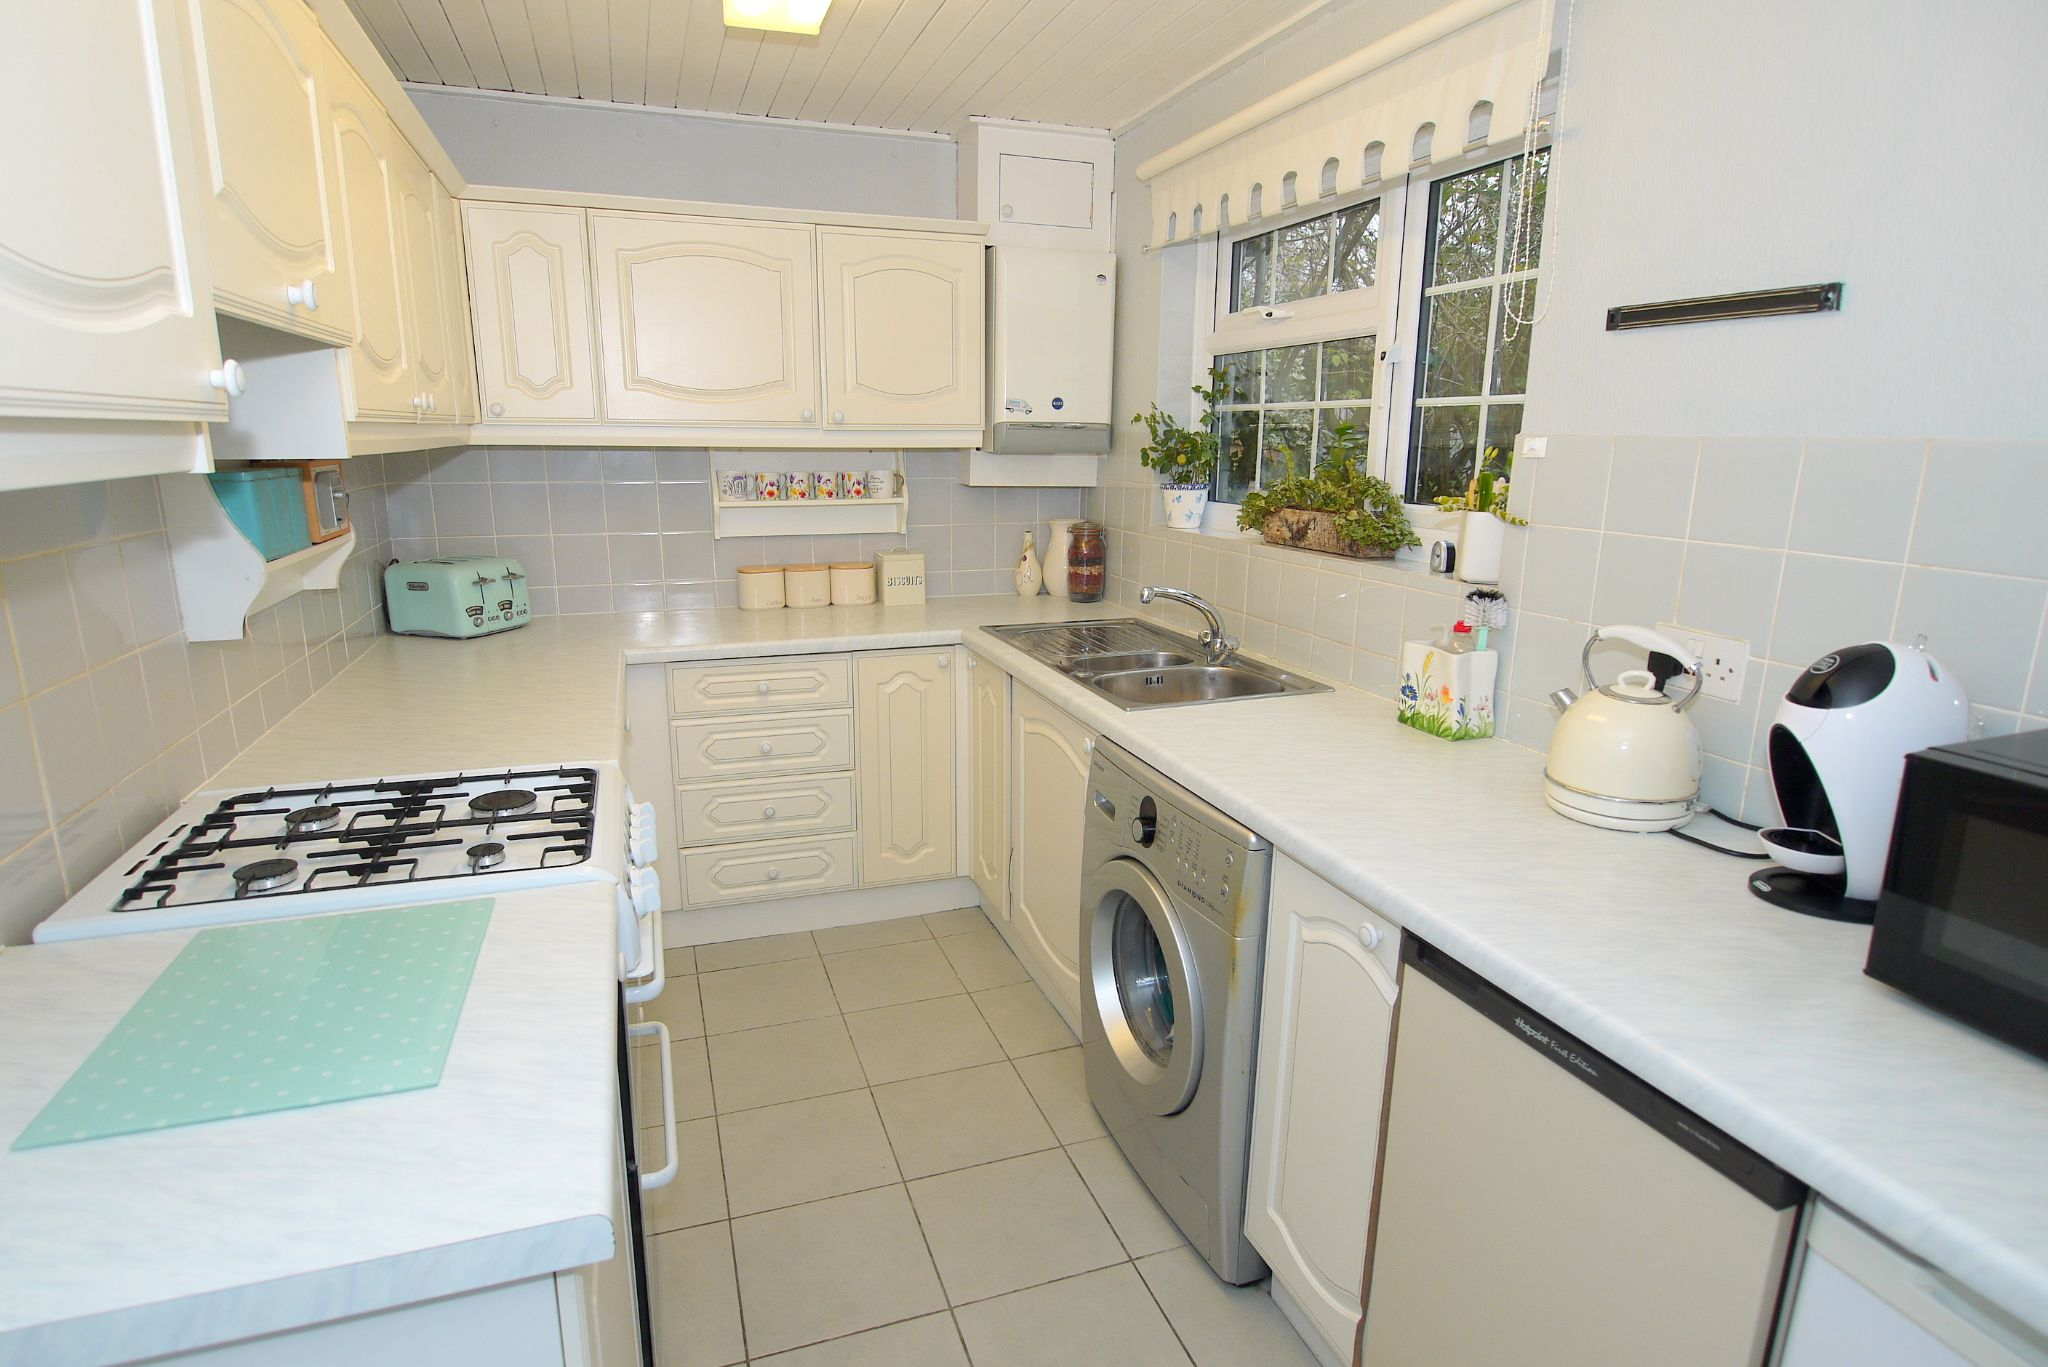 3 bedroom semi-detached house Sold in Tonbridge - Photograph 4